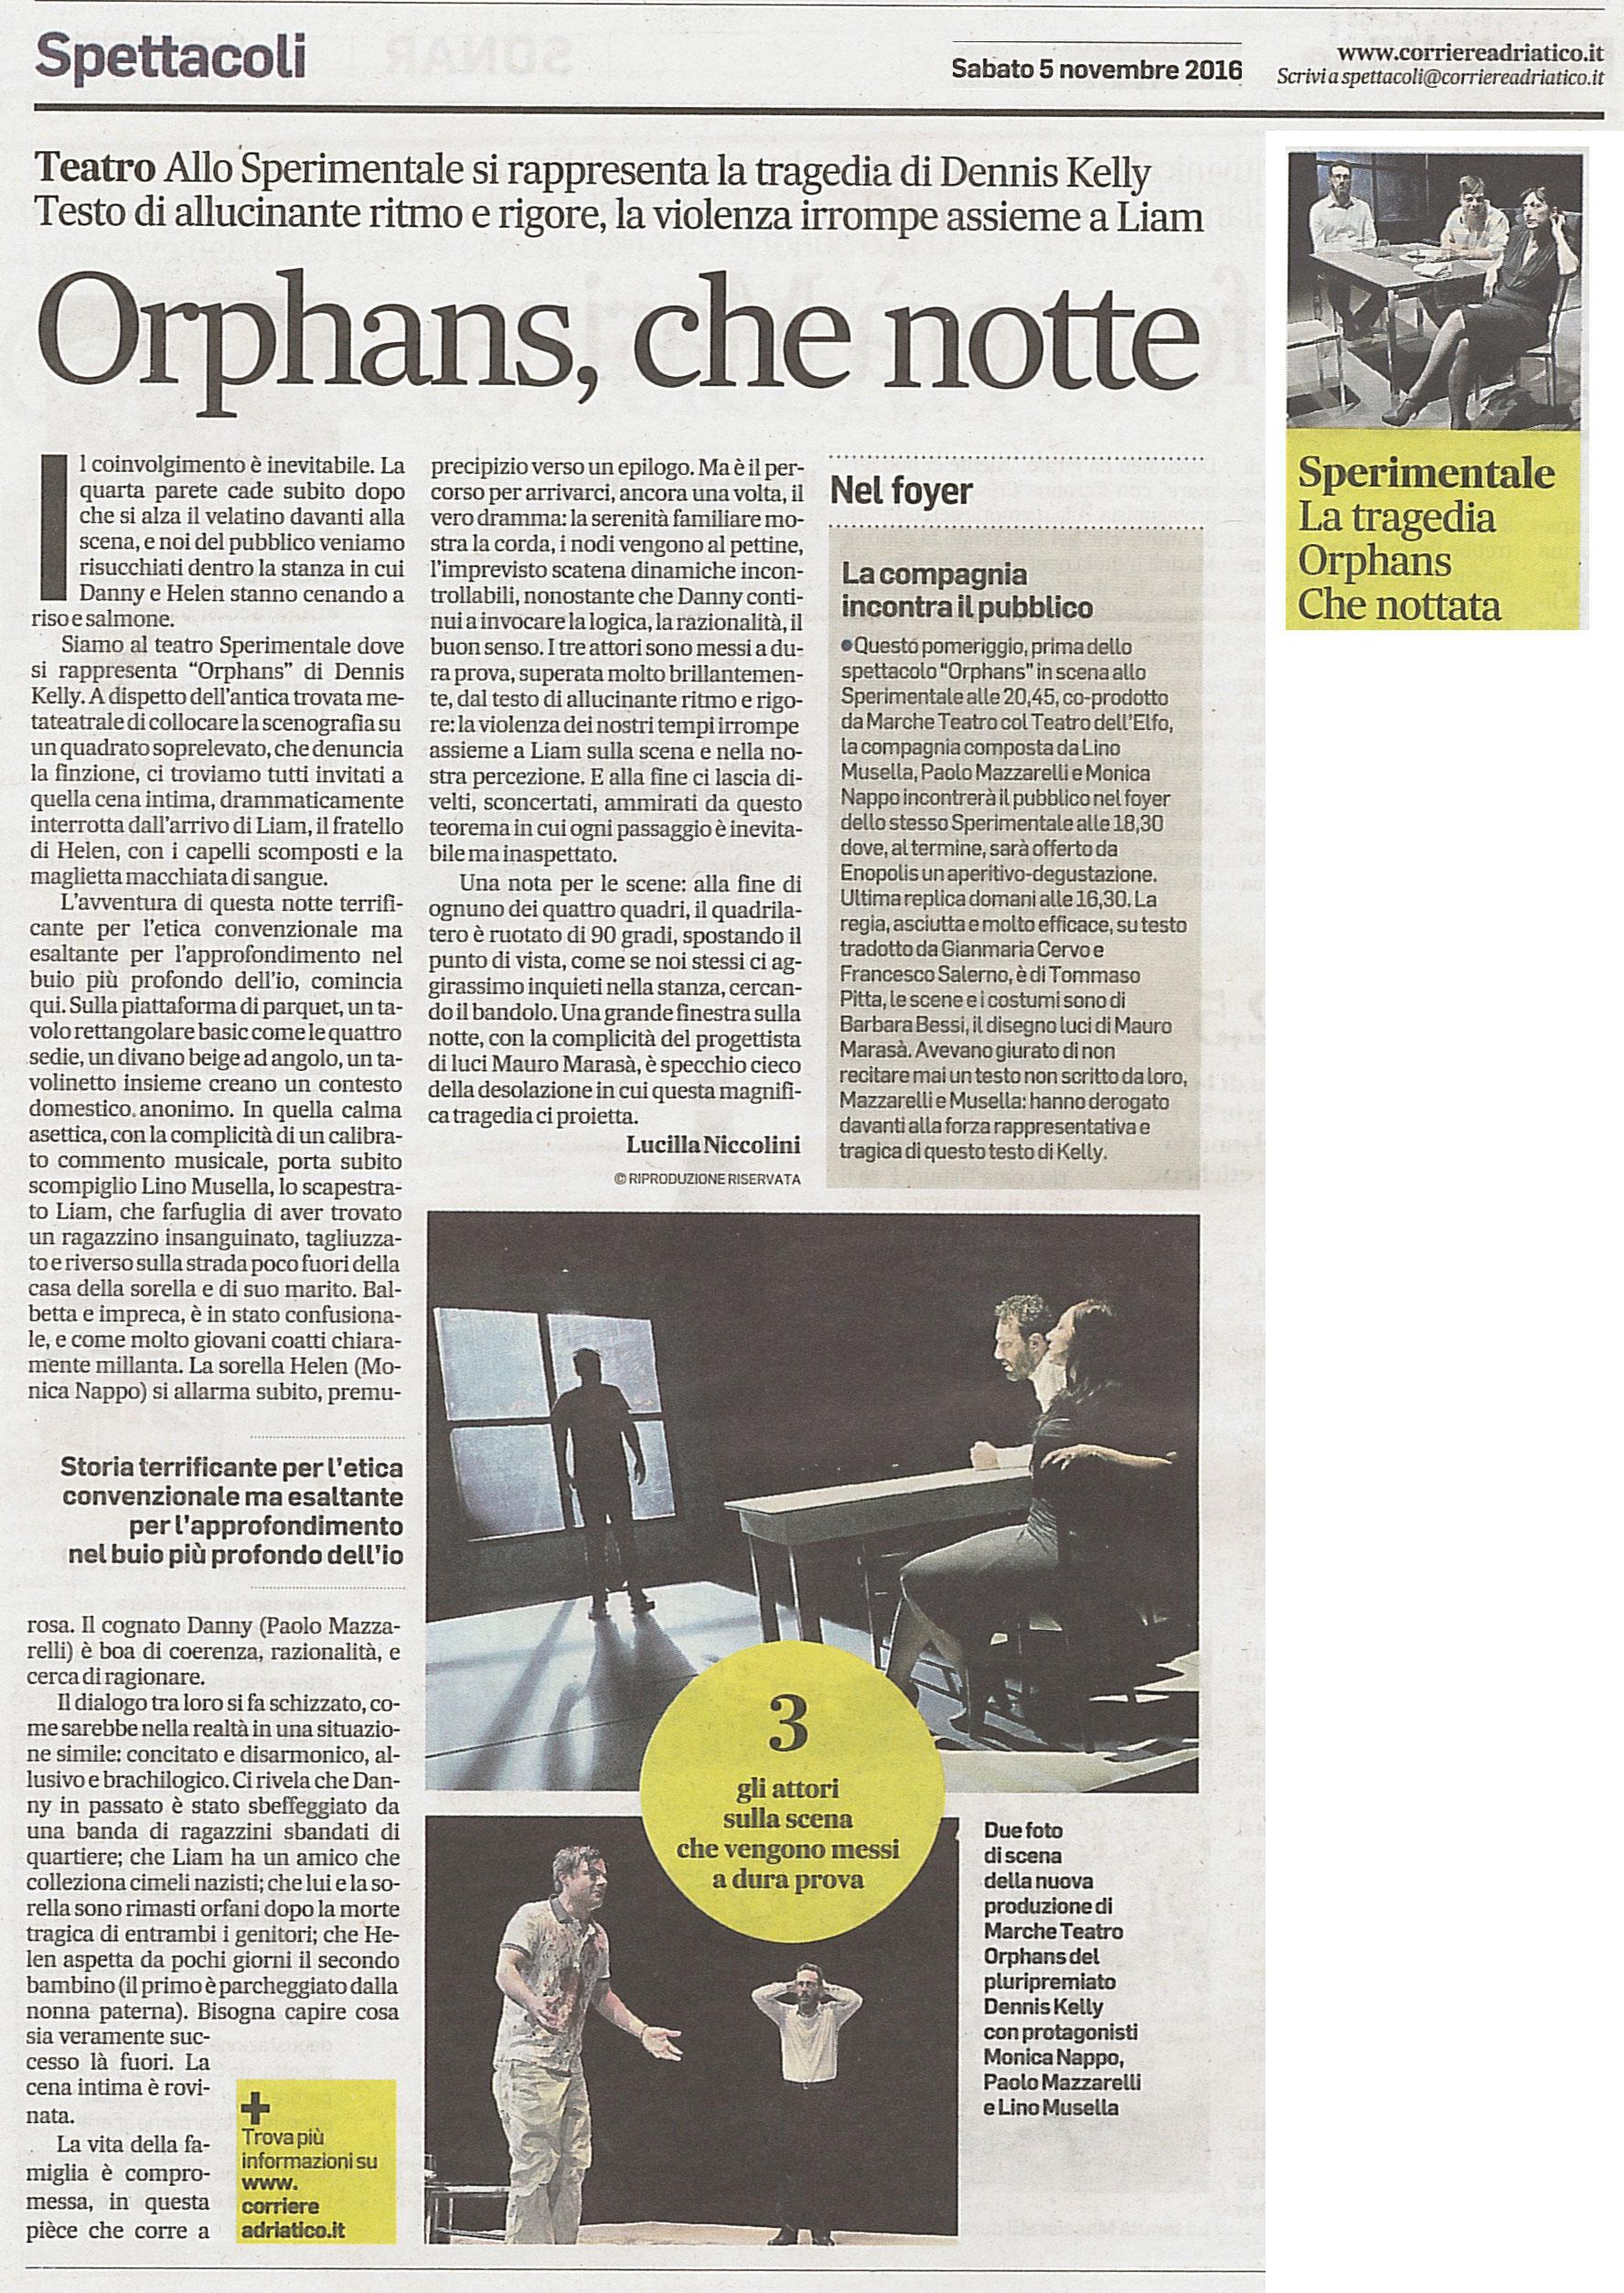 2016_11_05_orphans-che-notte_corriere-adriatico